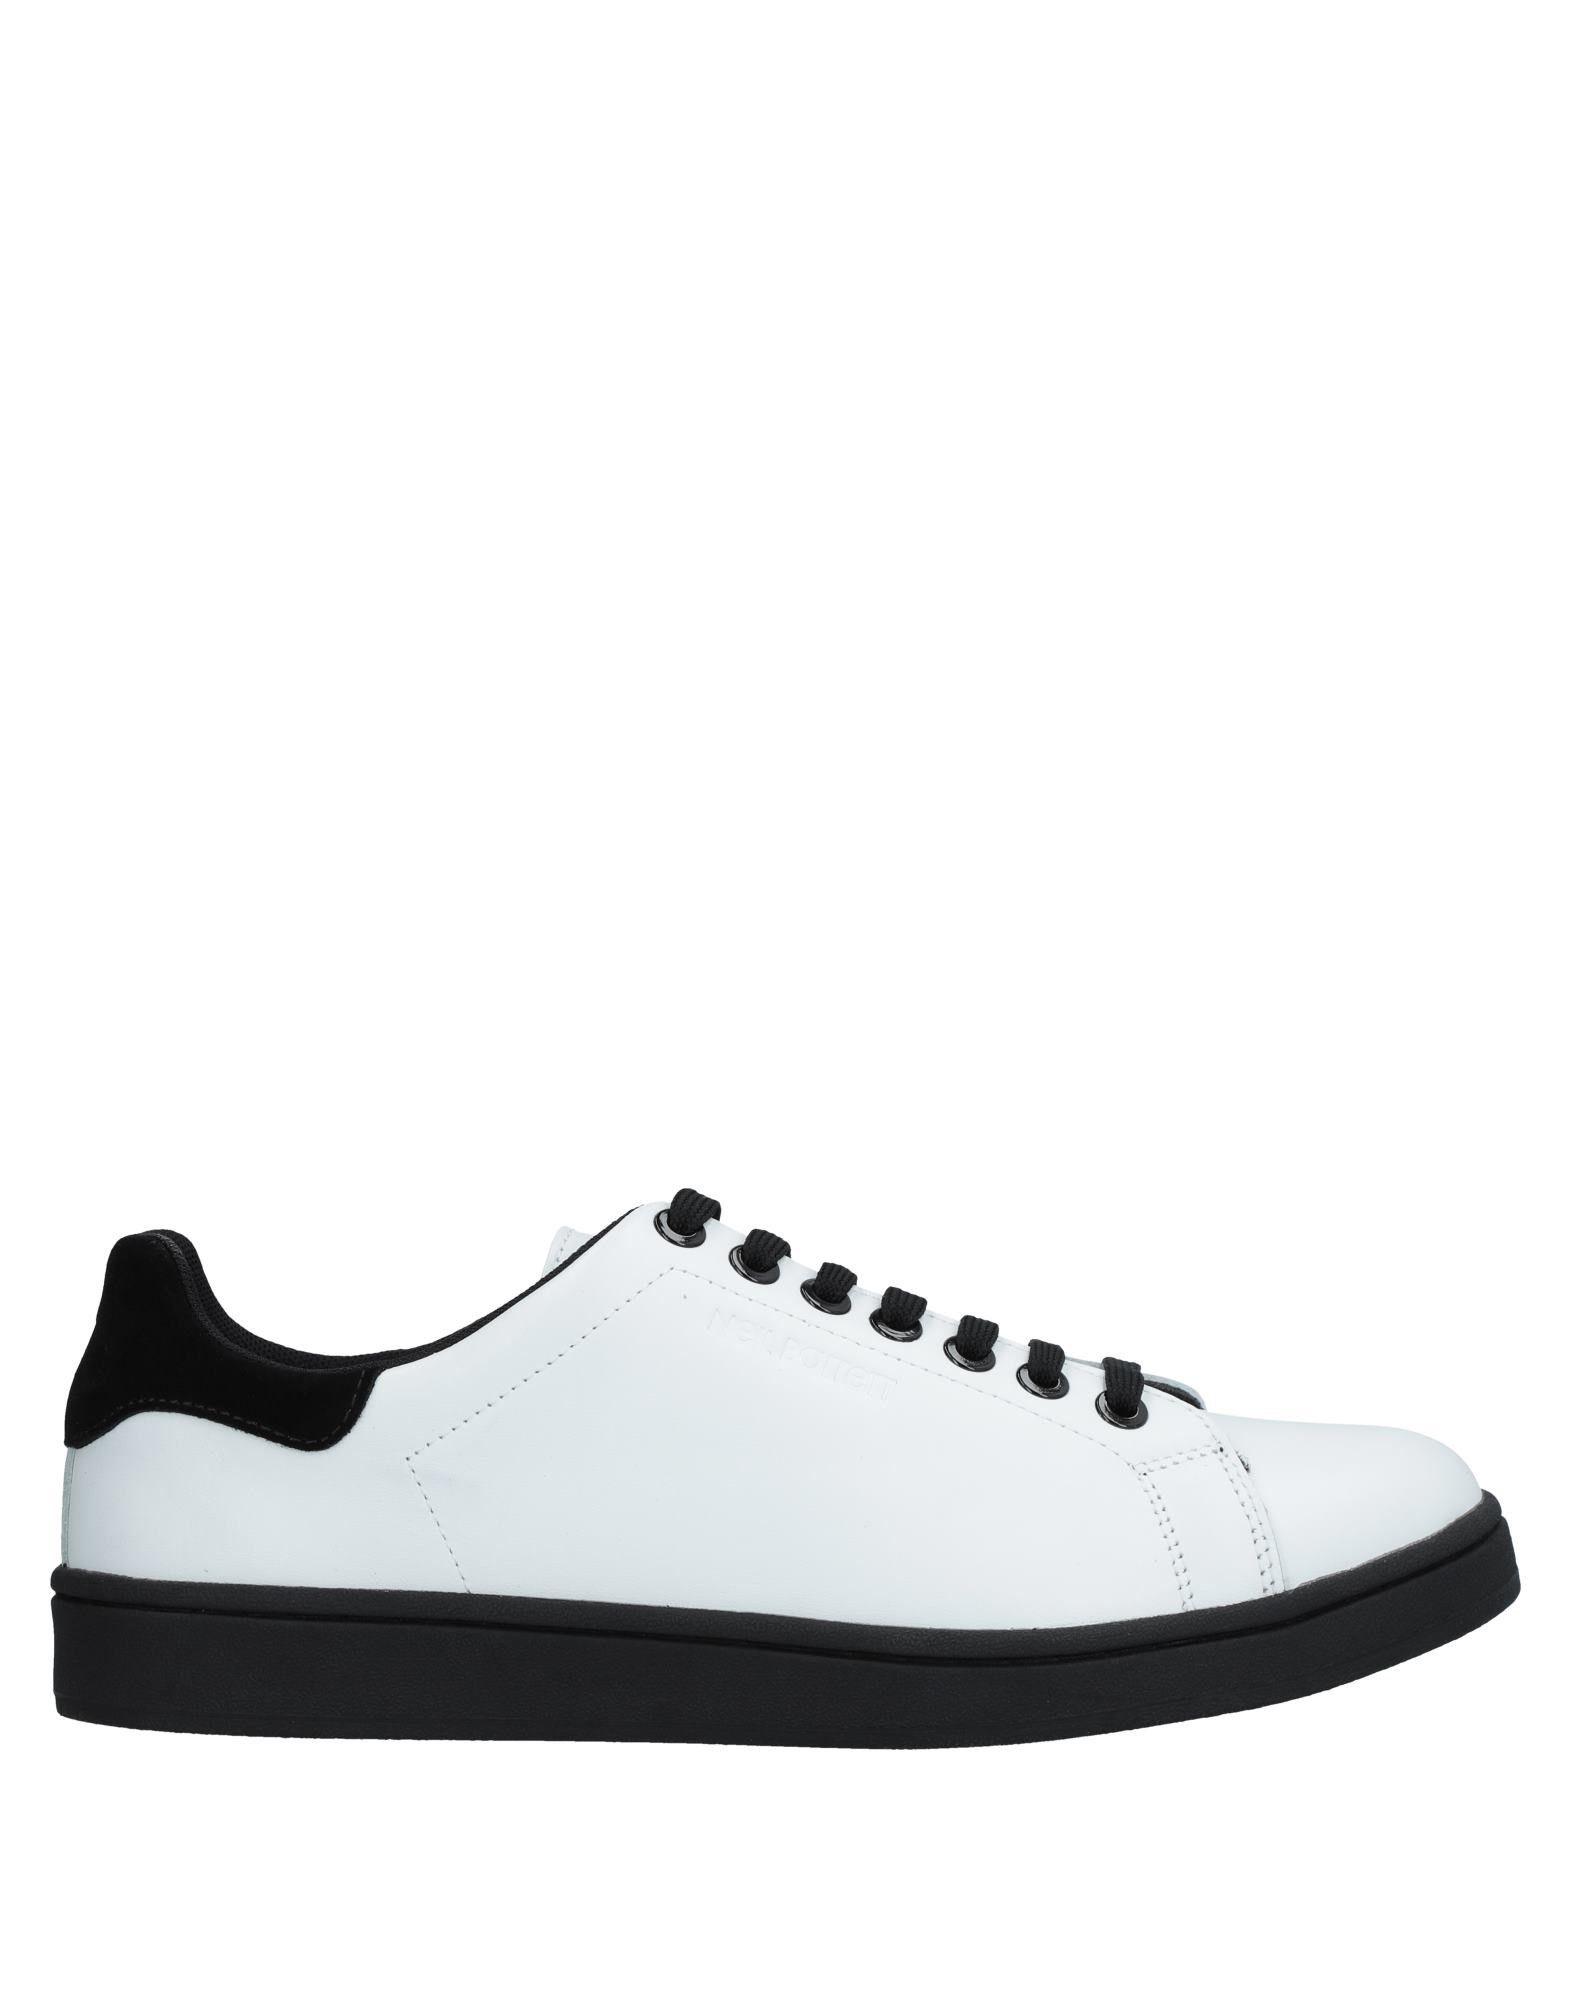 Sneakers Neil Barrett Uomo - 11529035UP 11529035UP - 0b86e8